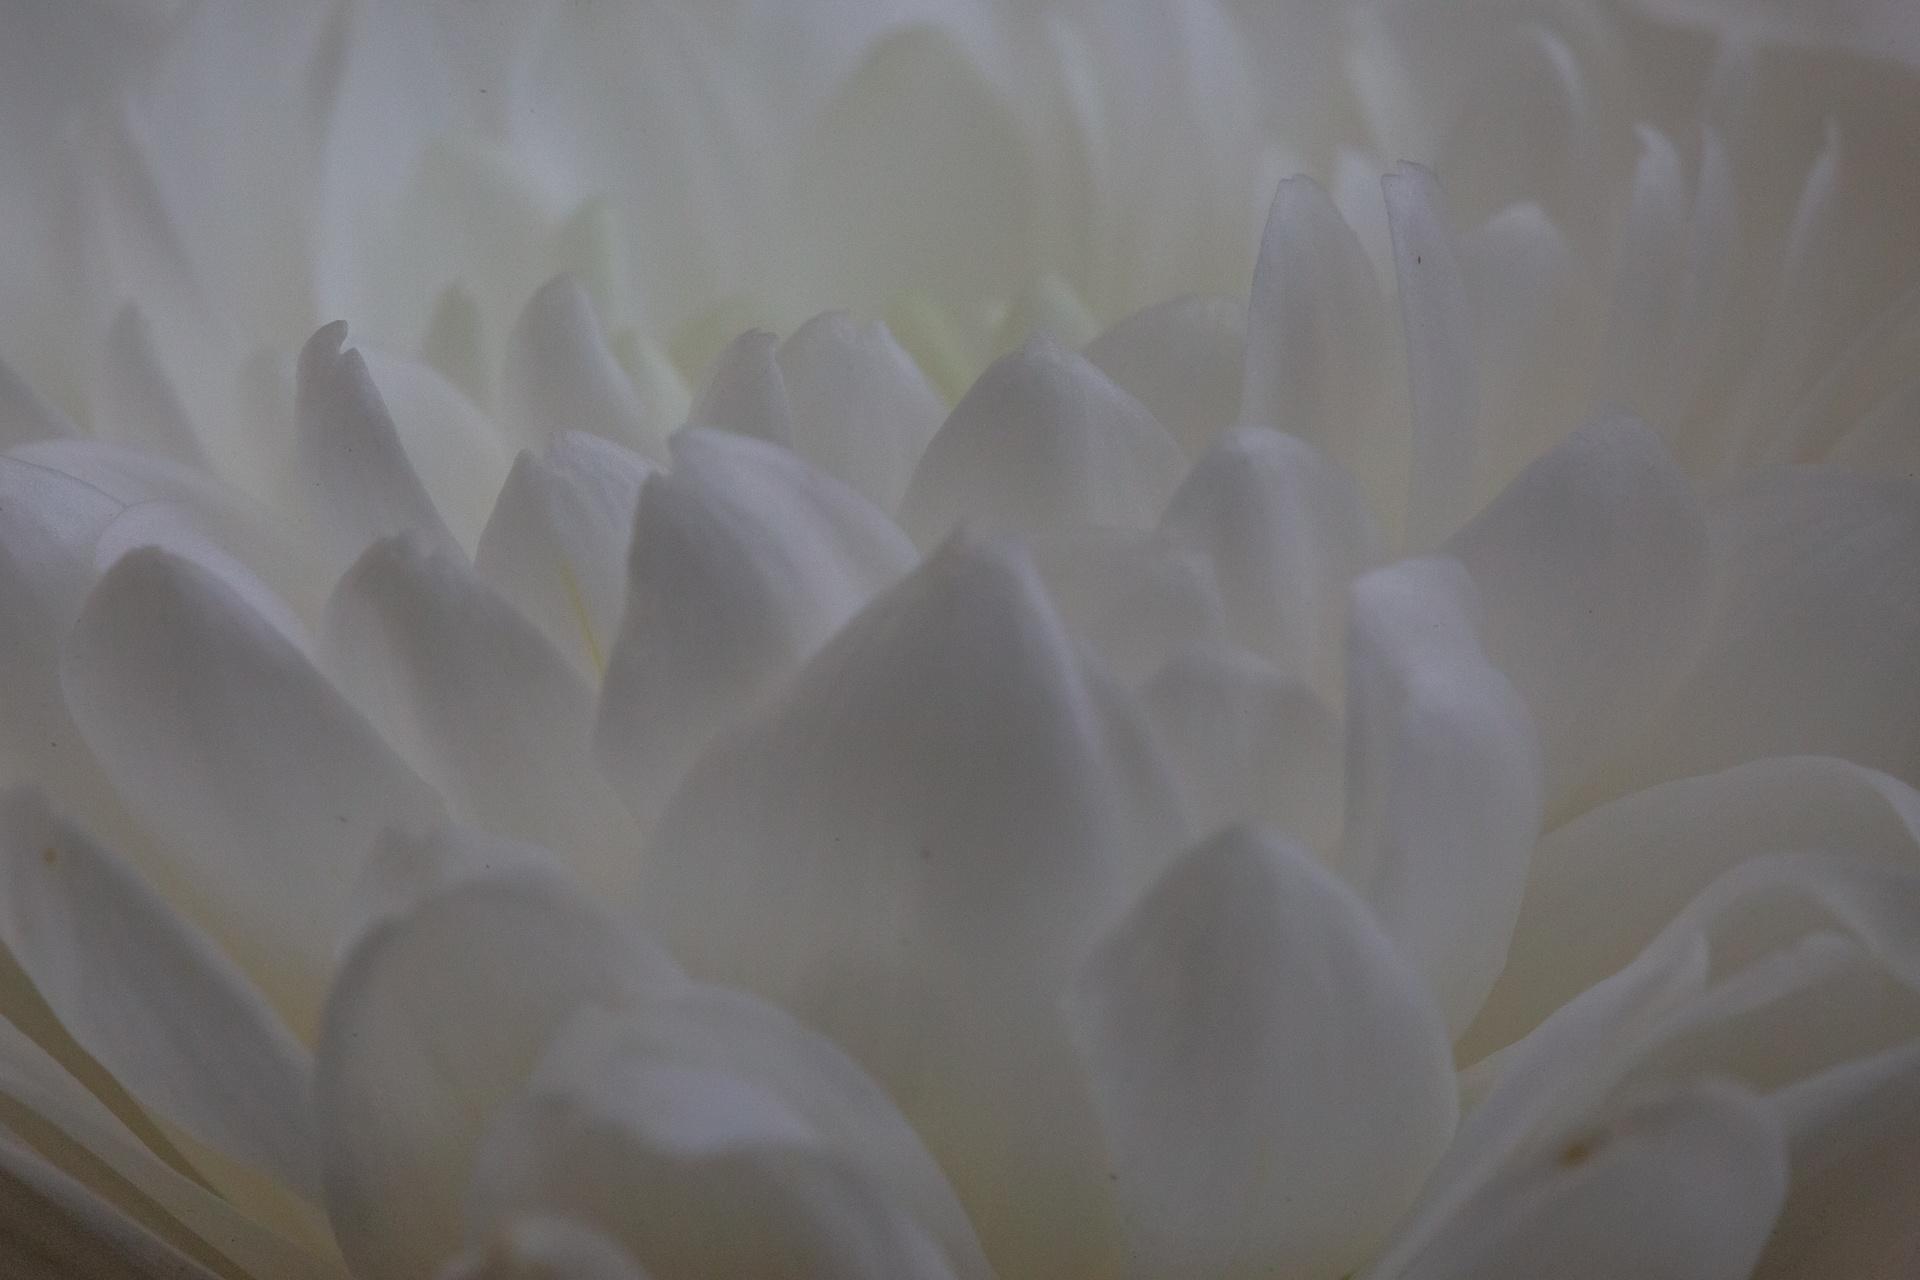 Centre of a chrysanthemum close up